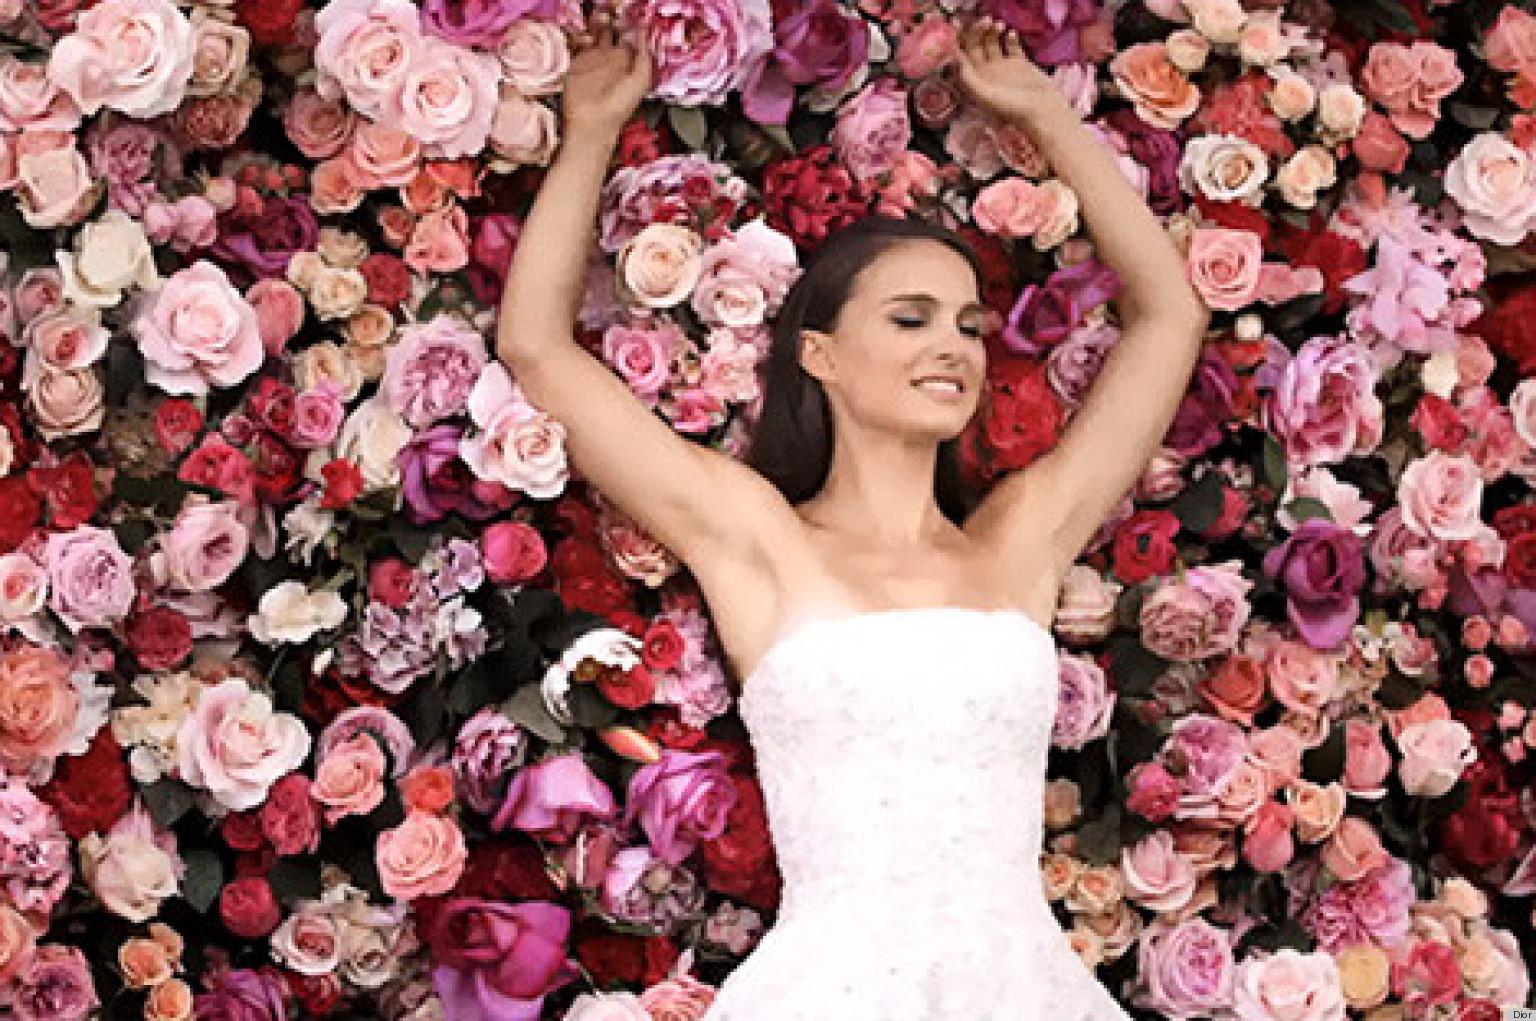 Beauty News, Vogue.it, 20/02/2013, link to original downloaded 12/01/17 from: http://www.vogue.it/en/beauty/beauty-news/2013/02/video-christian-dior-fragrance-miss-dior-la-vie-en-rose-natalie-portman-sofia-coppola